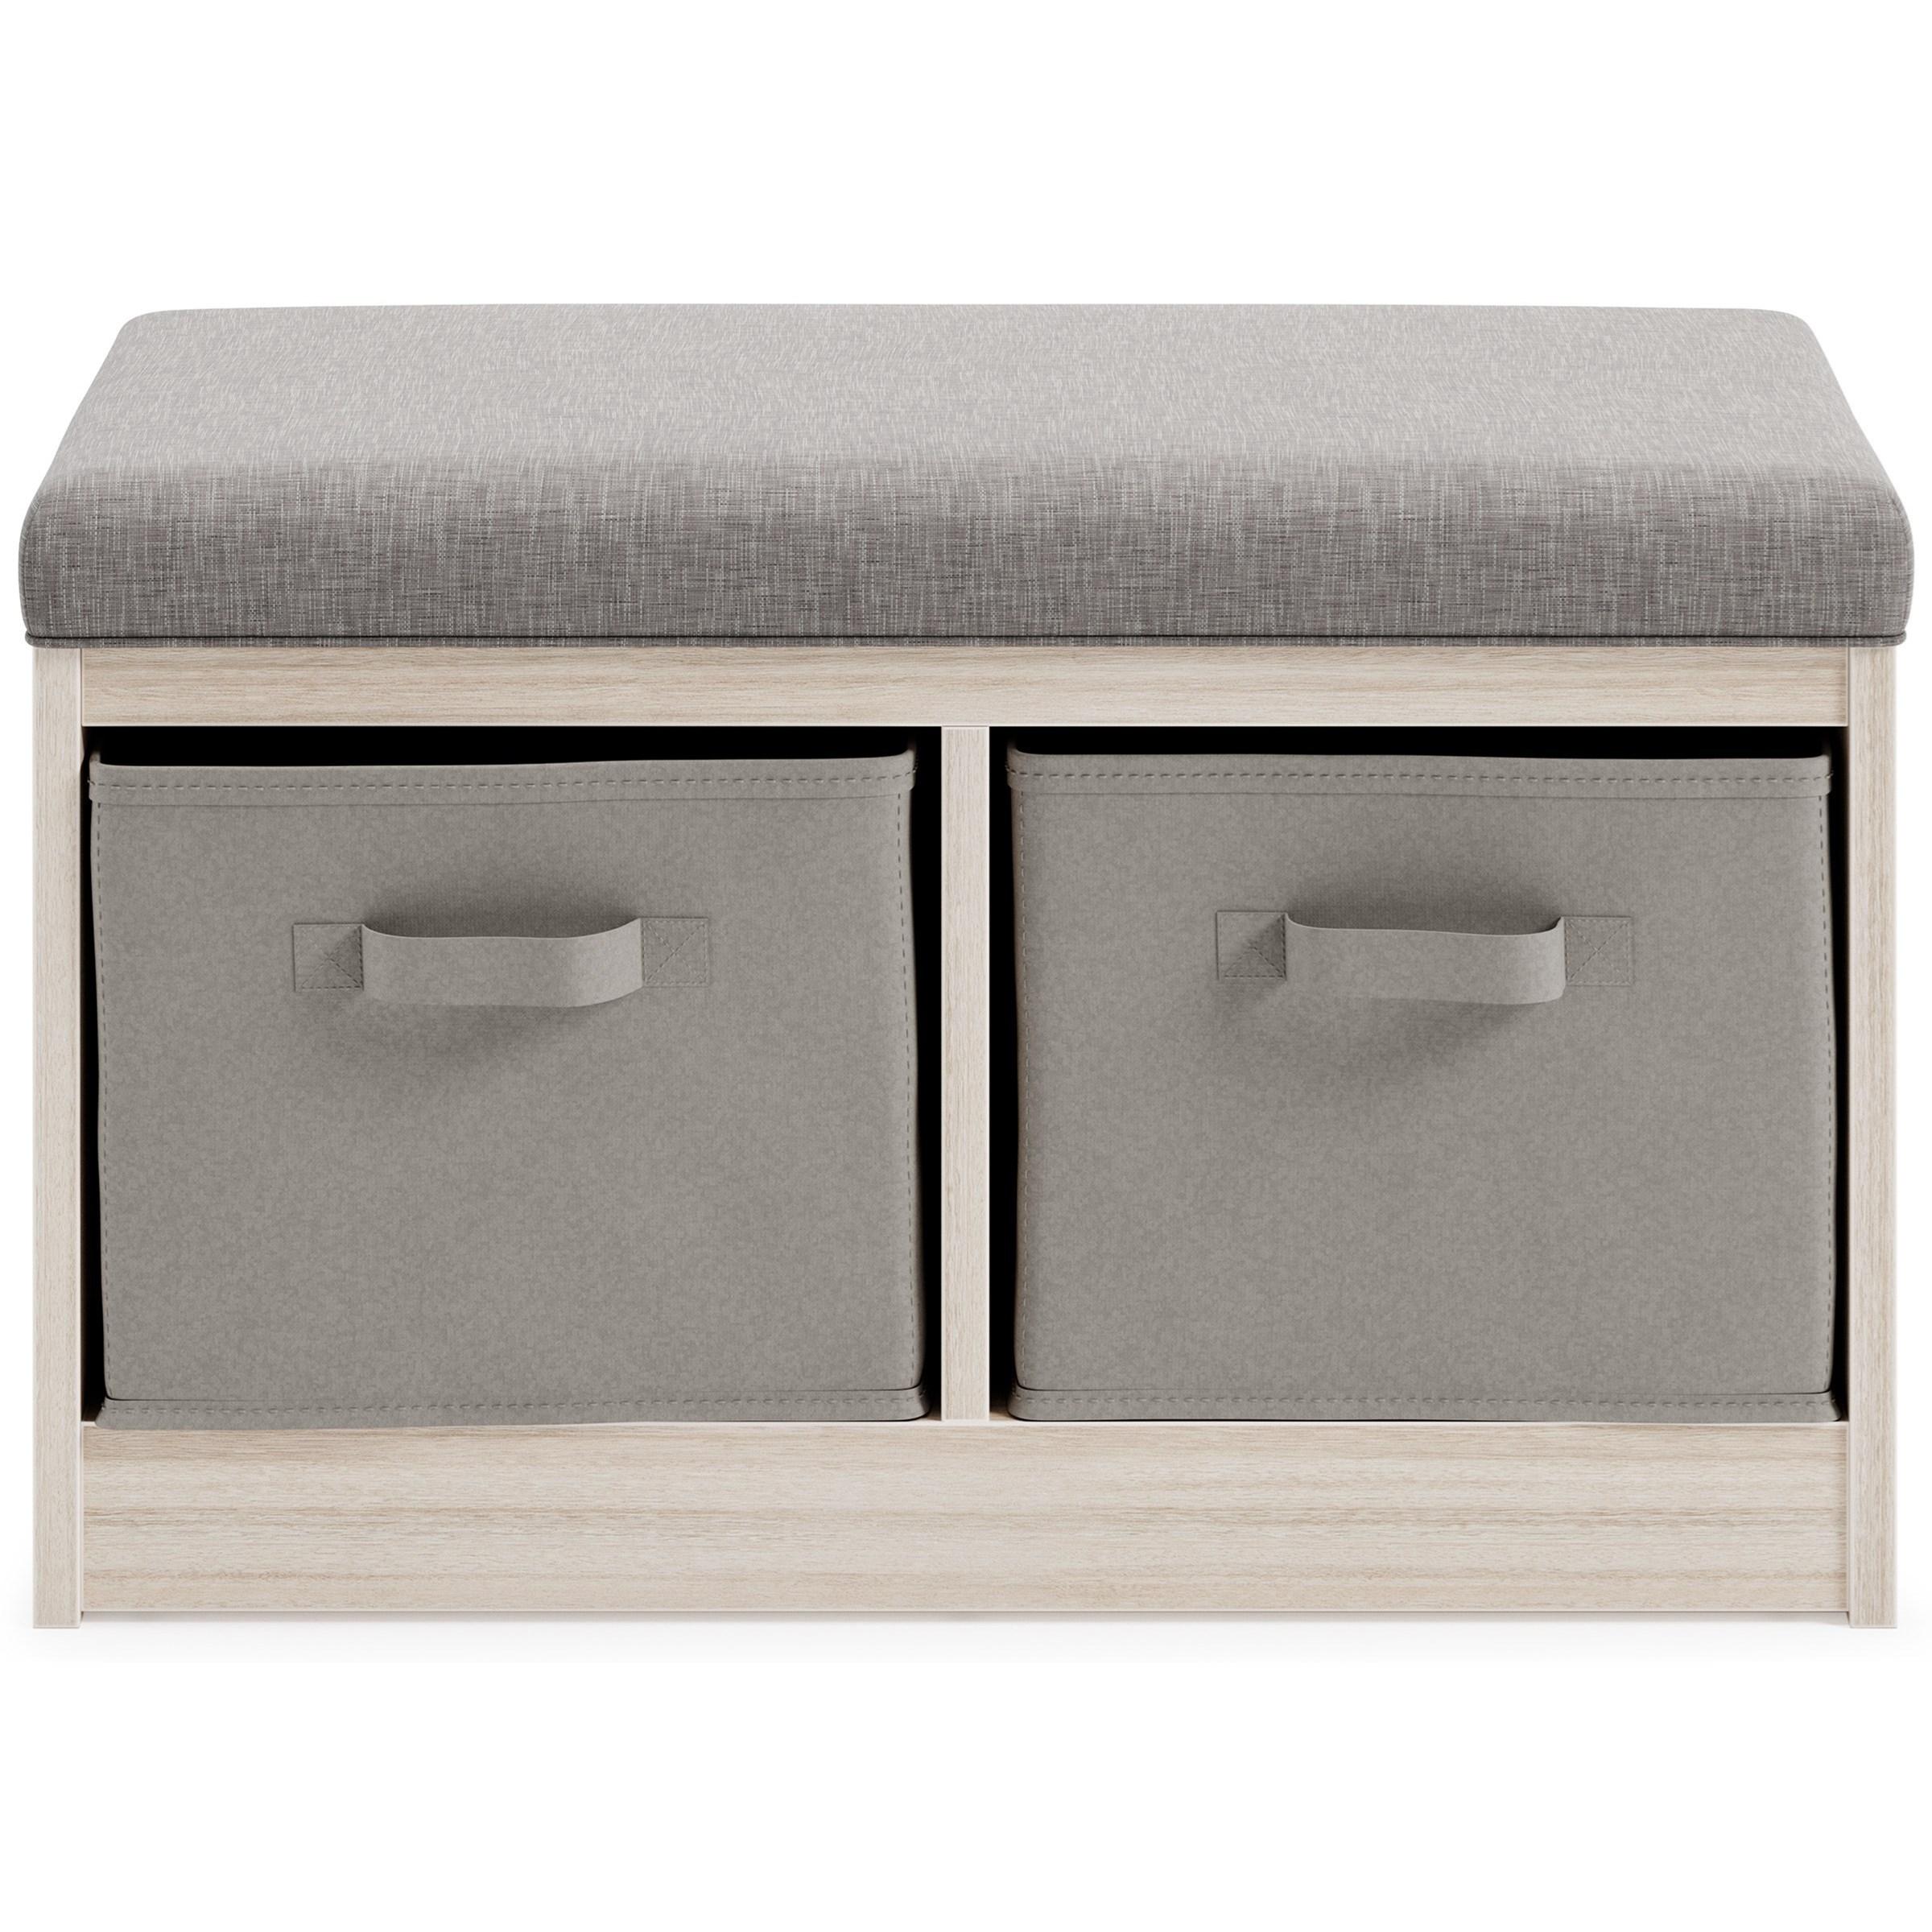 Blariden Storage Bench by StyleLine at EFO Furniture Outlet